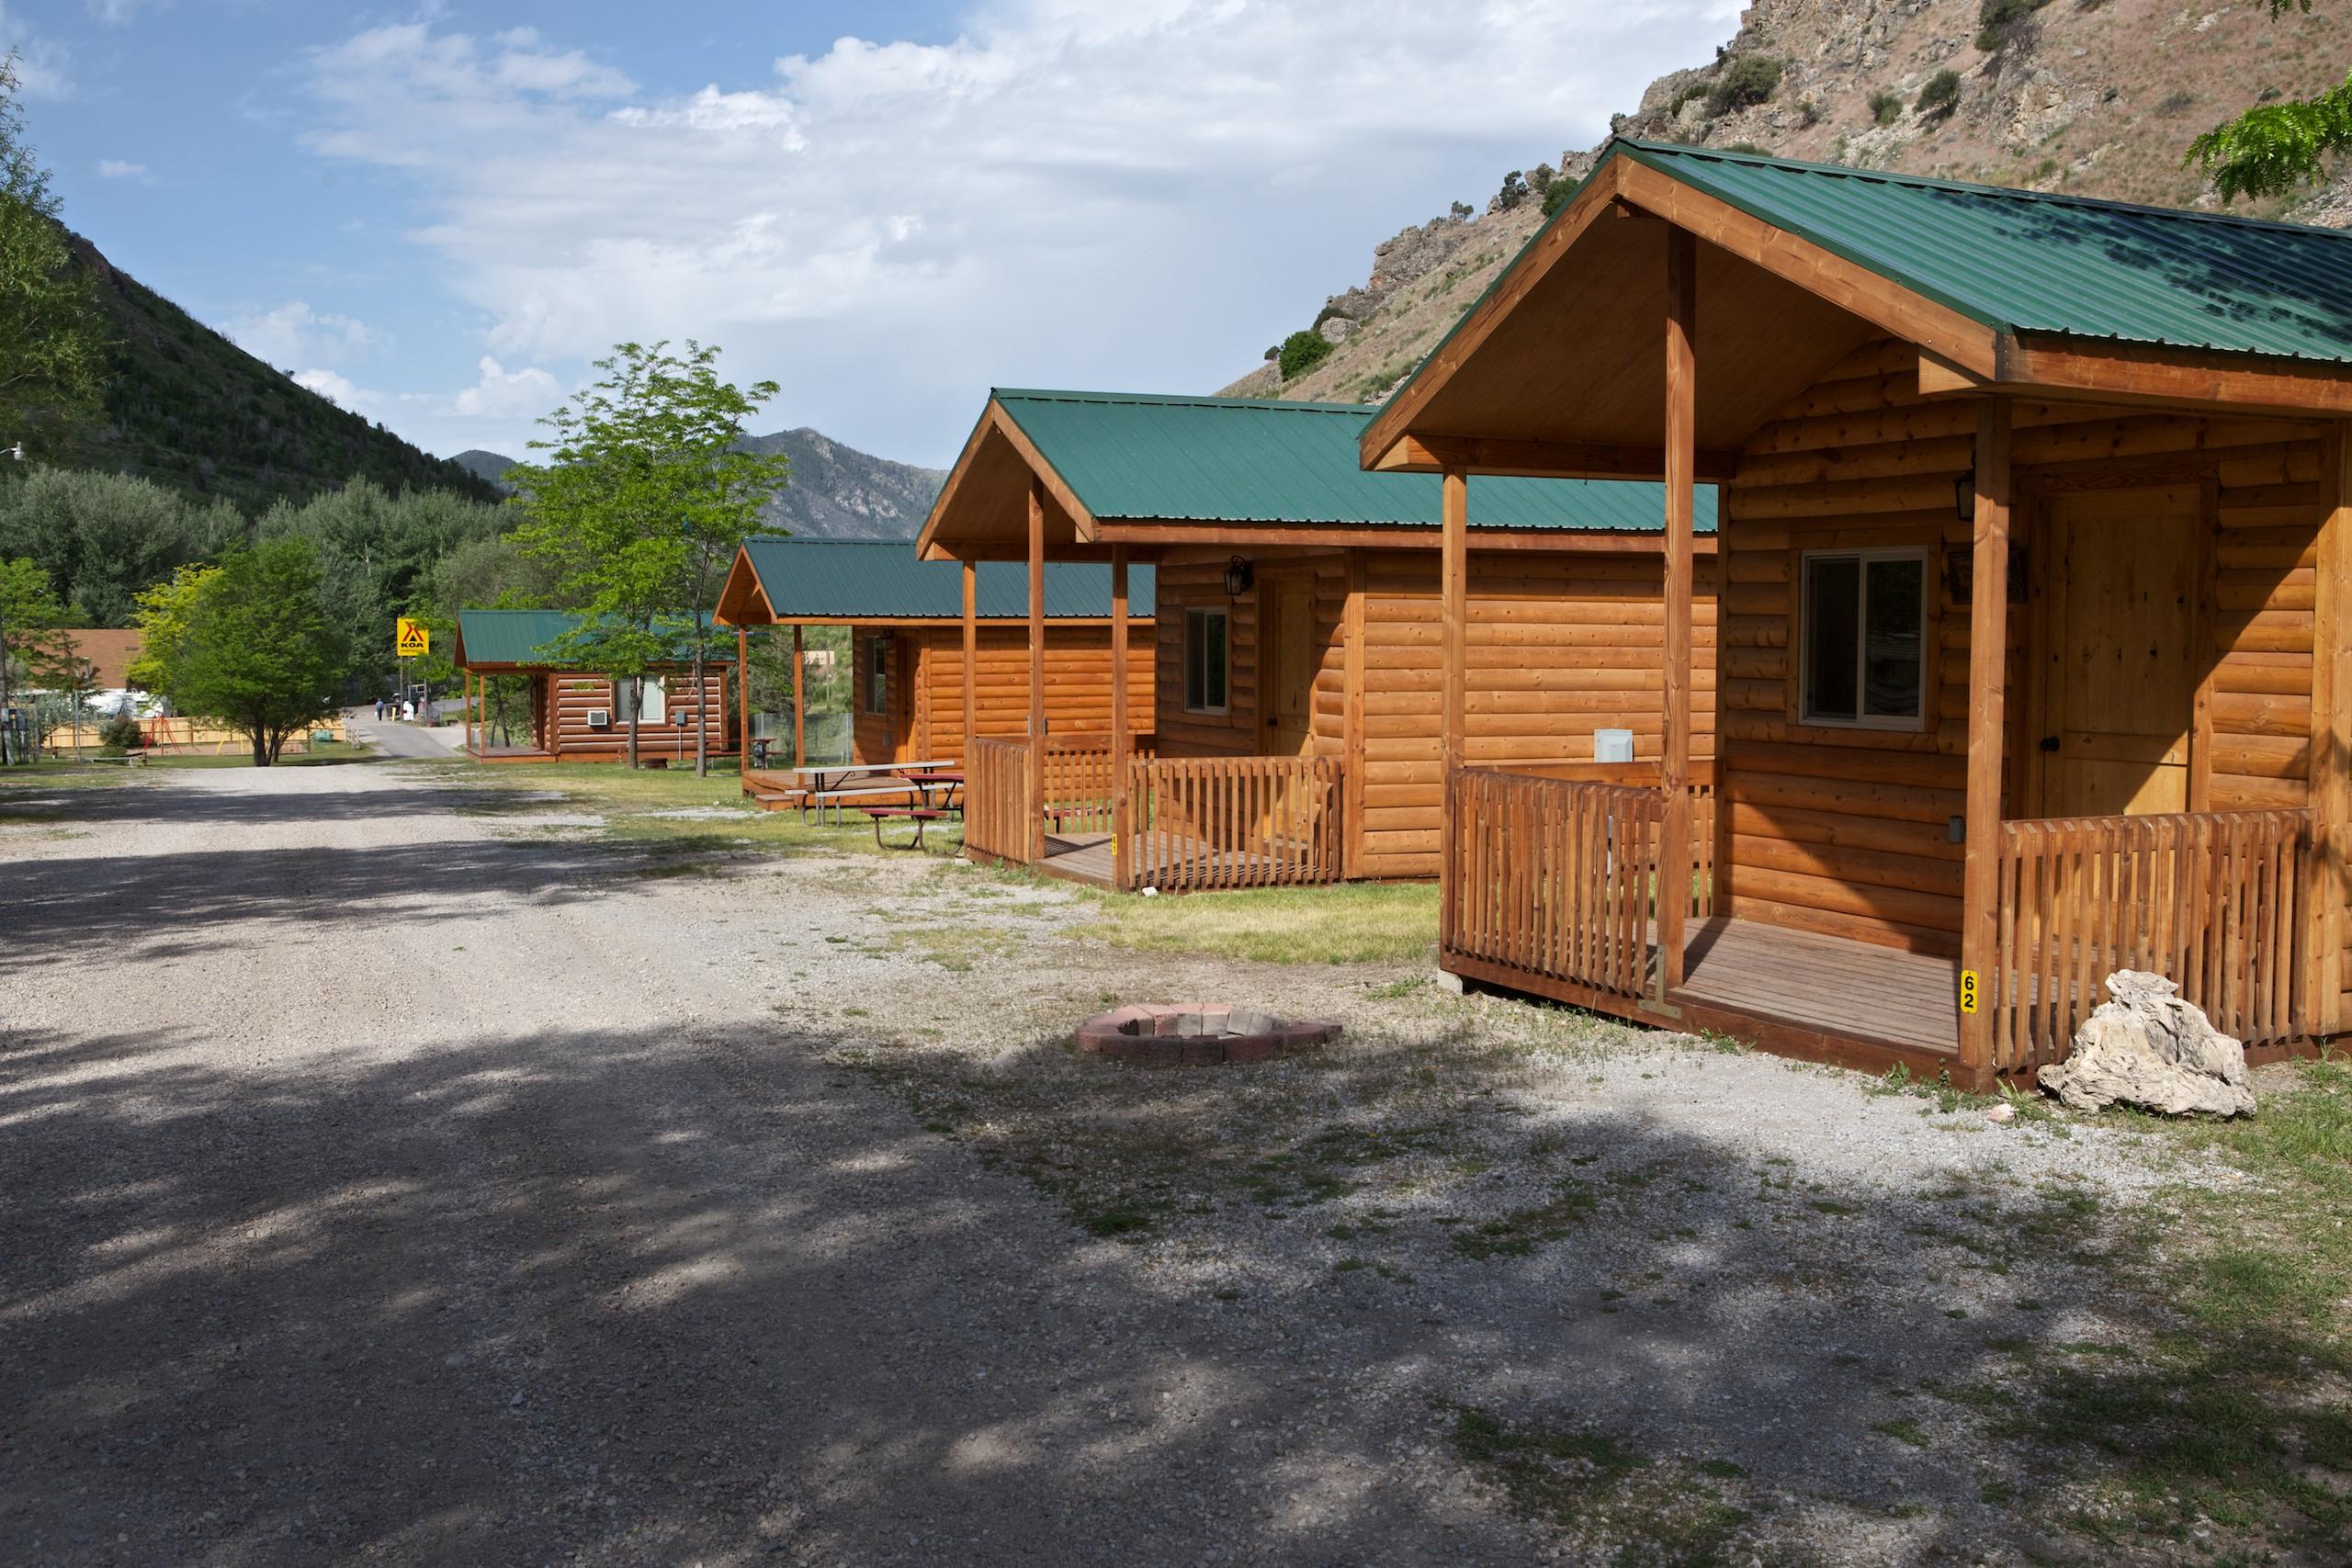 Lava Hot Springs KOA Holiday image 11